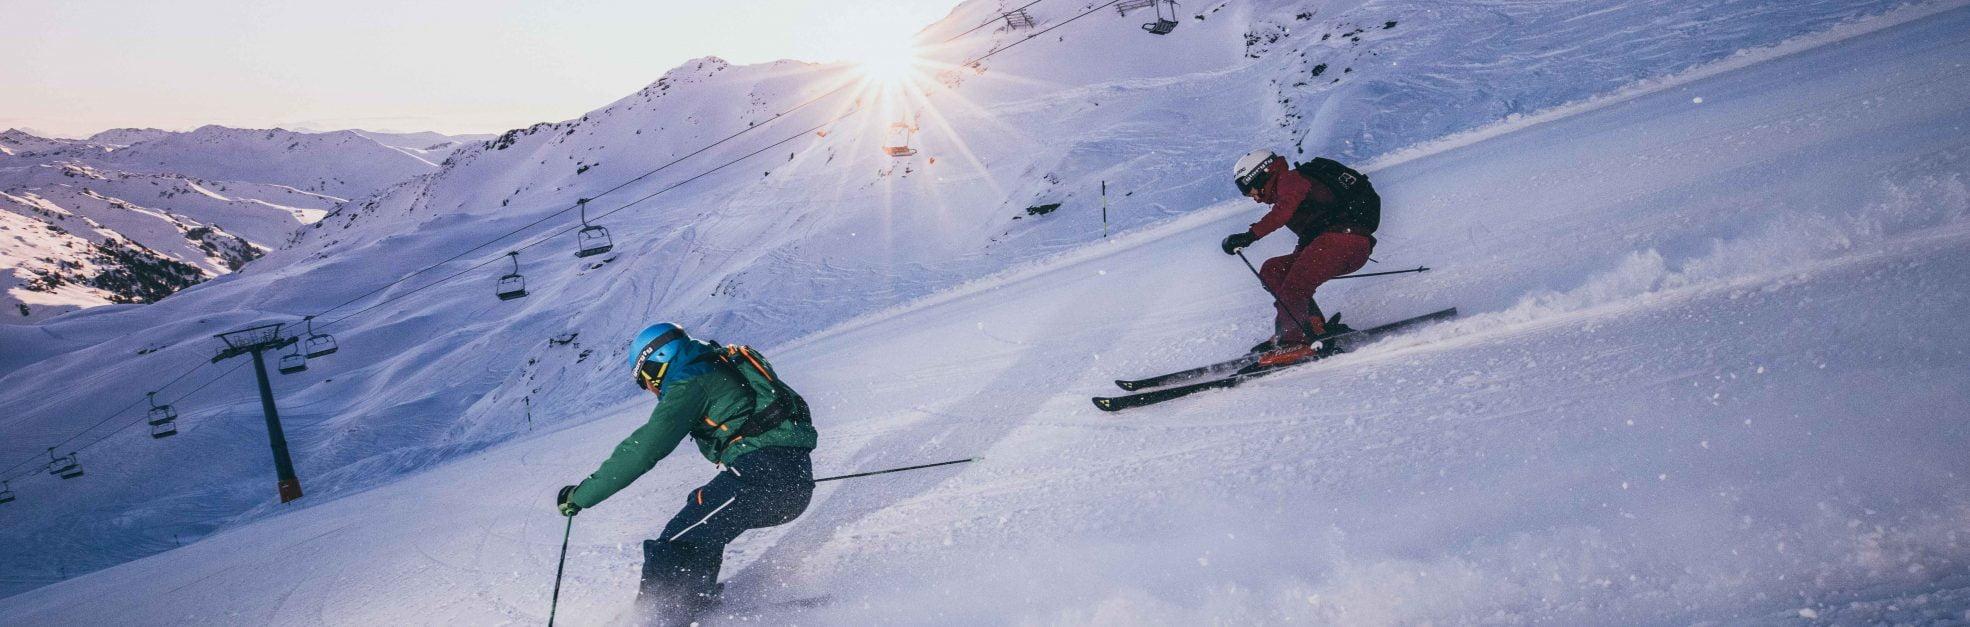 Skifahren in Krimml - Sport Patterer